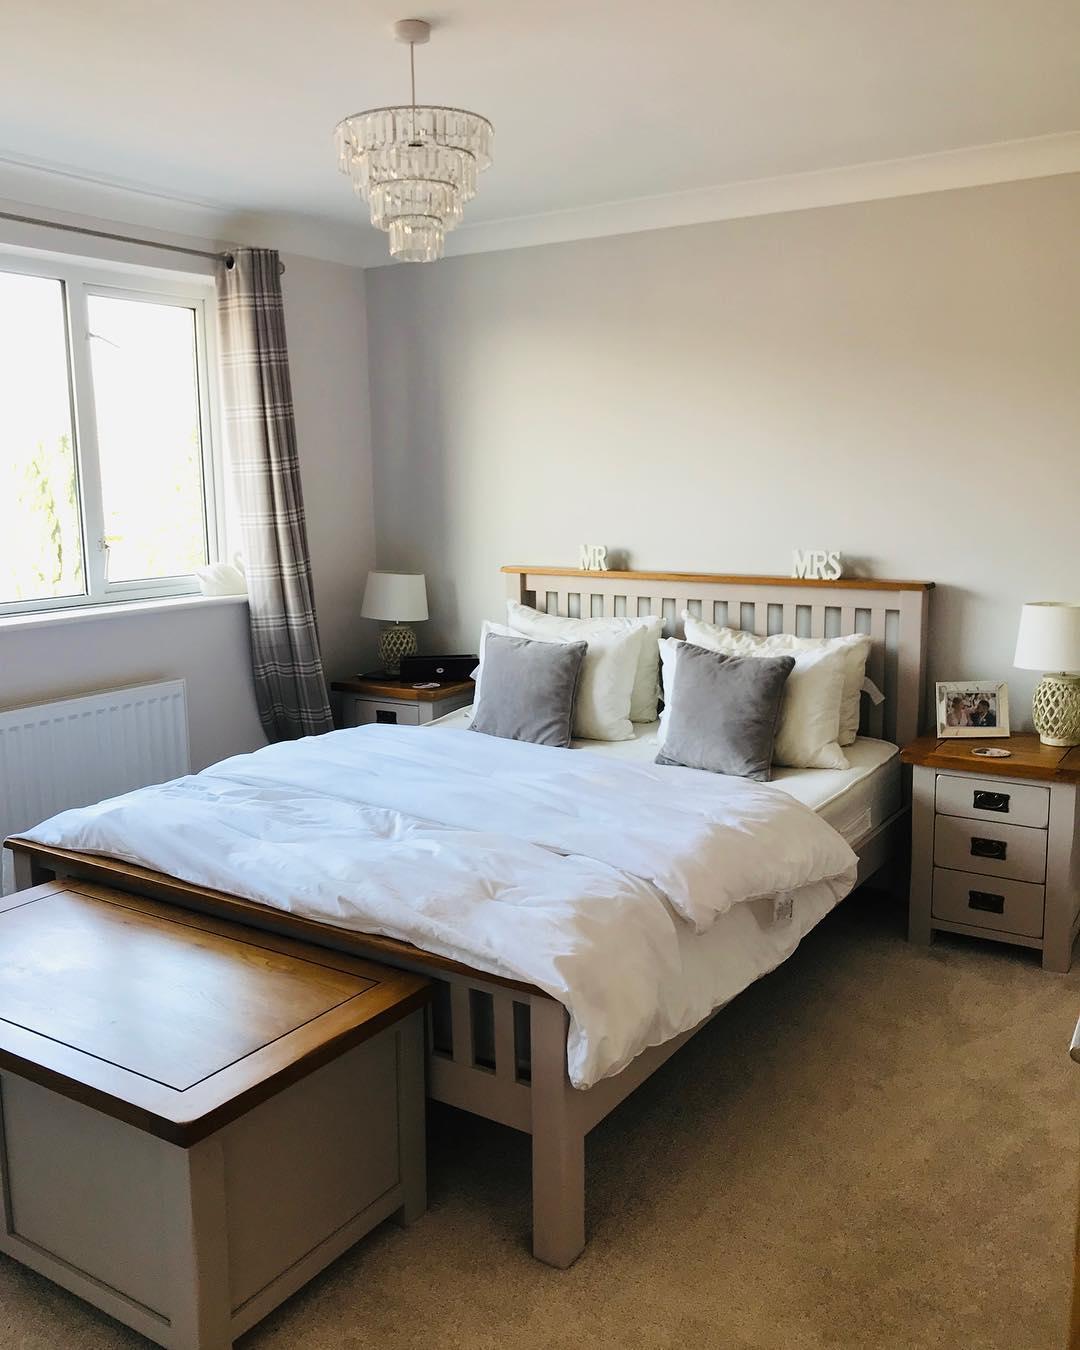 Grey painted kemble bedroom furniture in bright bedroom